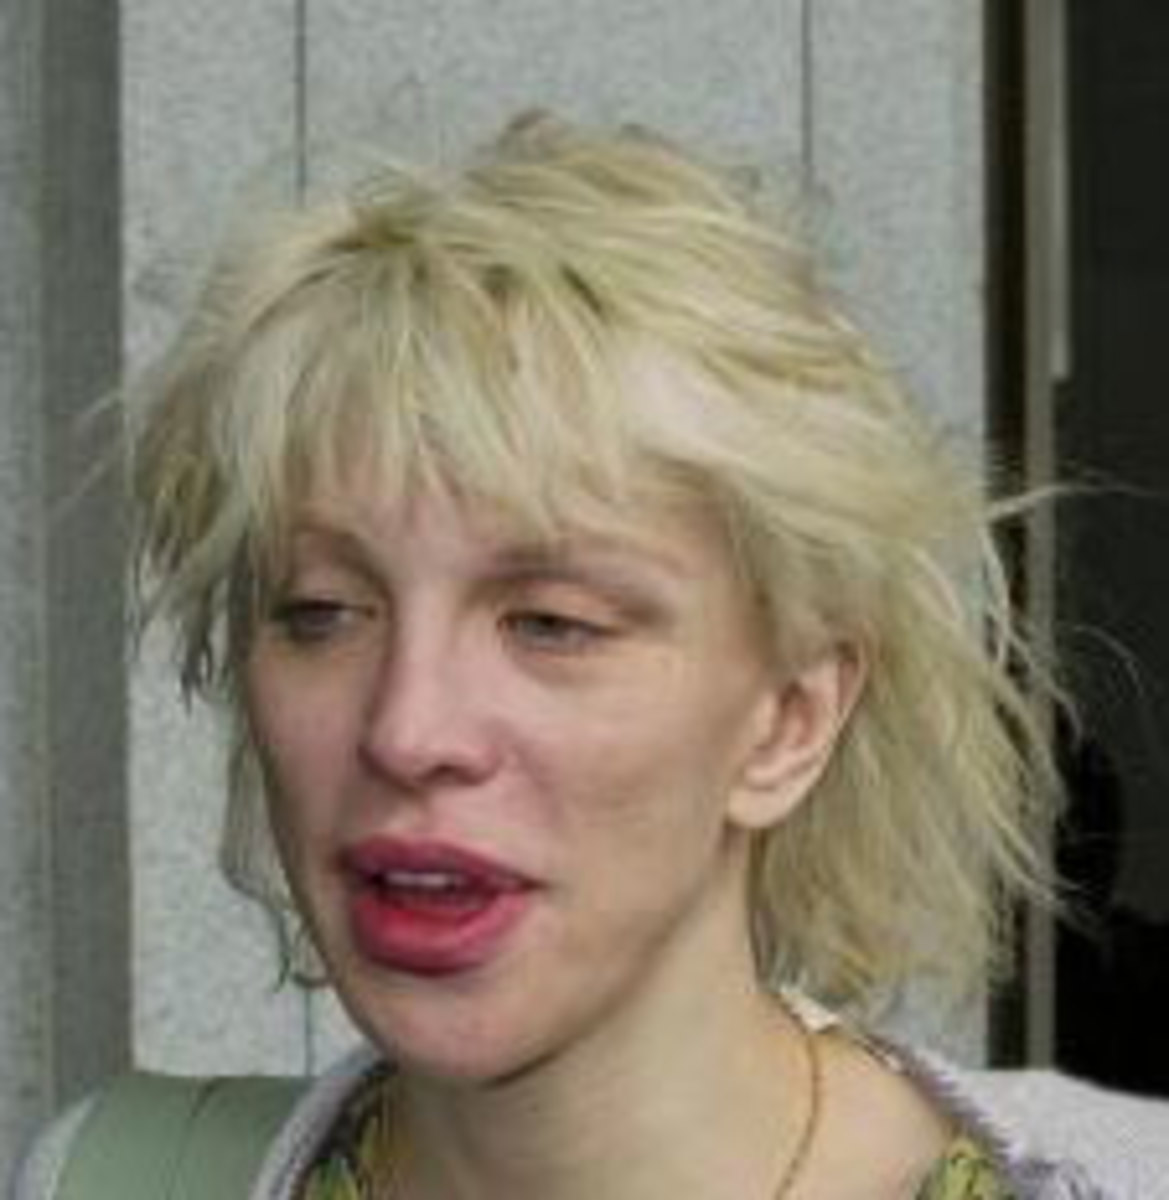 Courtney Love of Hole